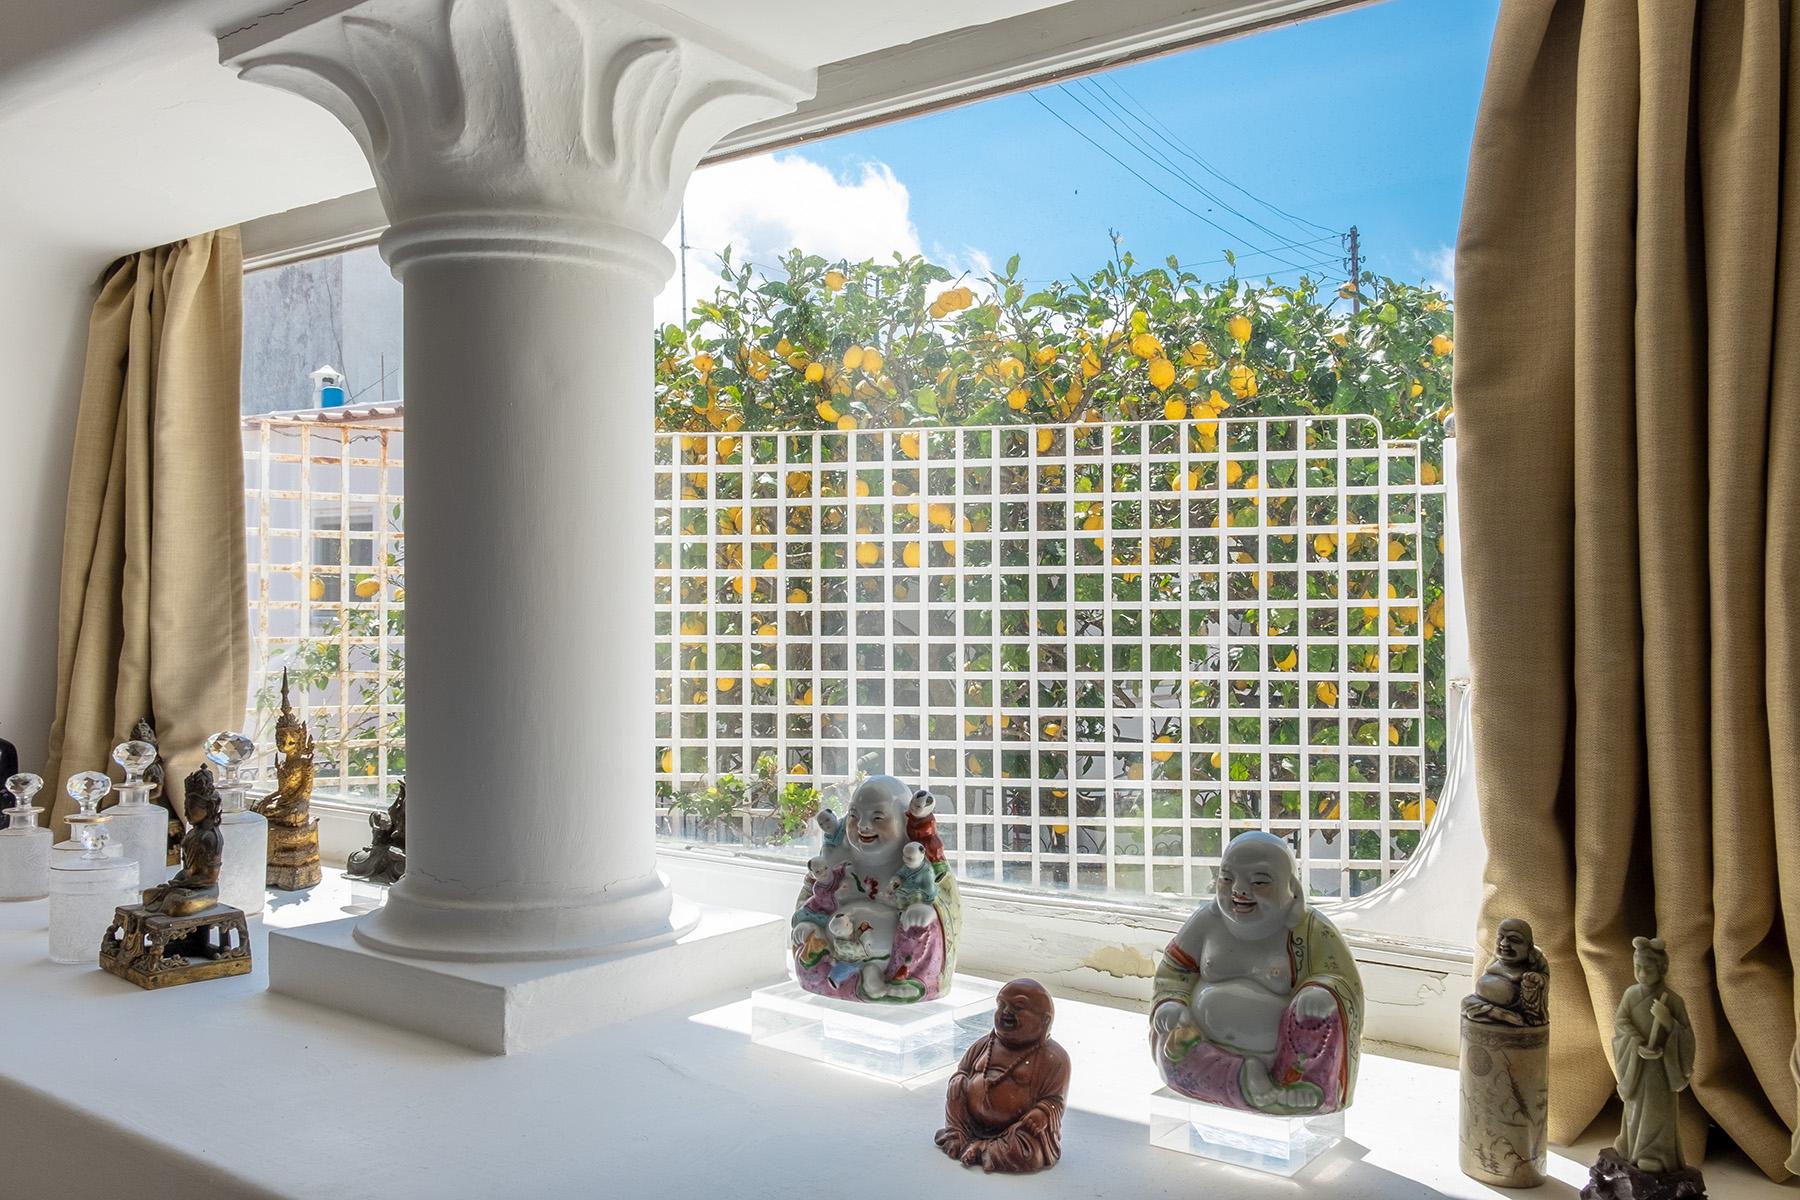 Casa indipendente in Vendita a Capri: 5 locali, 300 mq - Foto 26